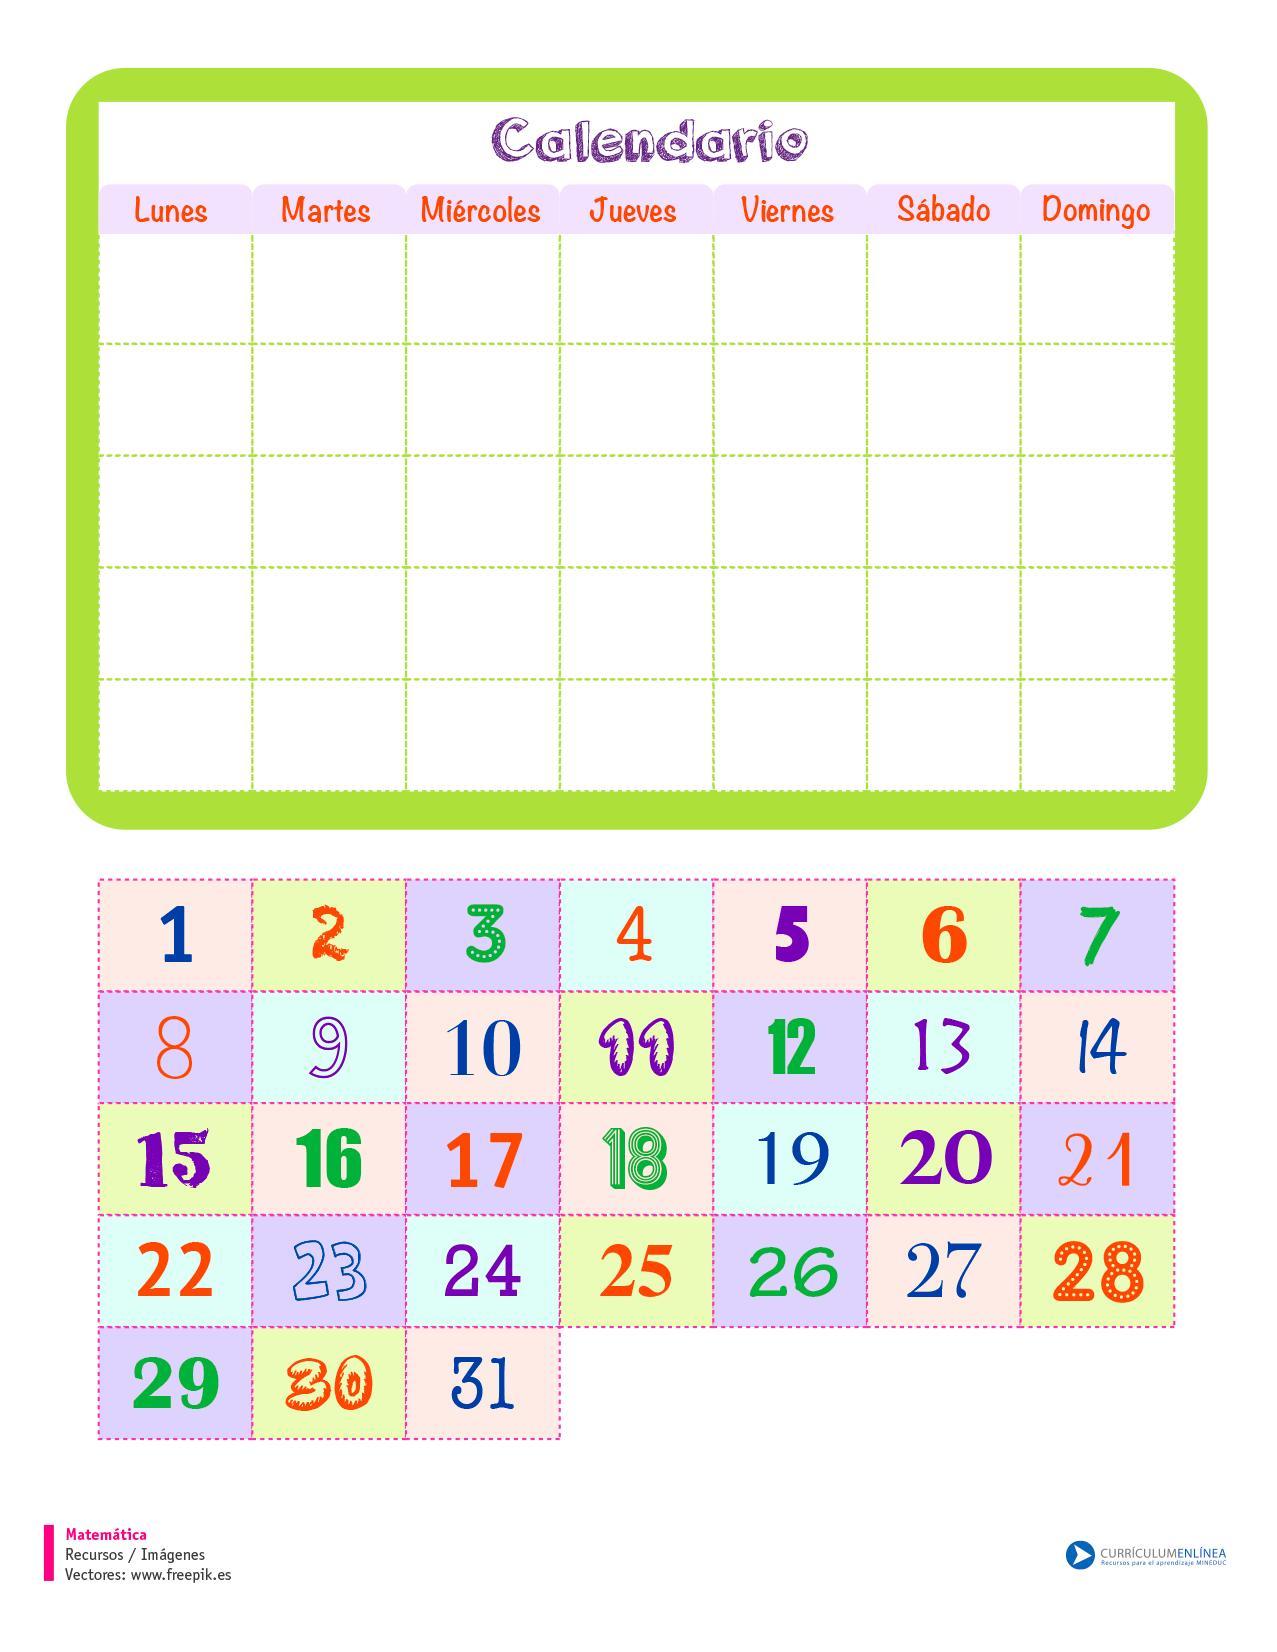 Calendario De Semanas.Calendario Curriculum Nacional Mineduc Chile